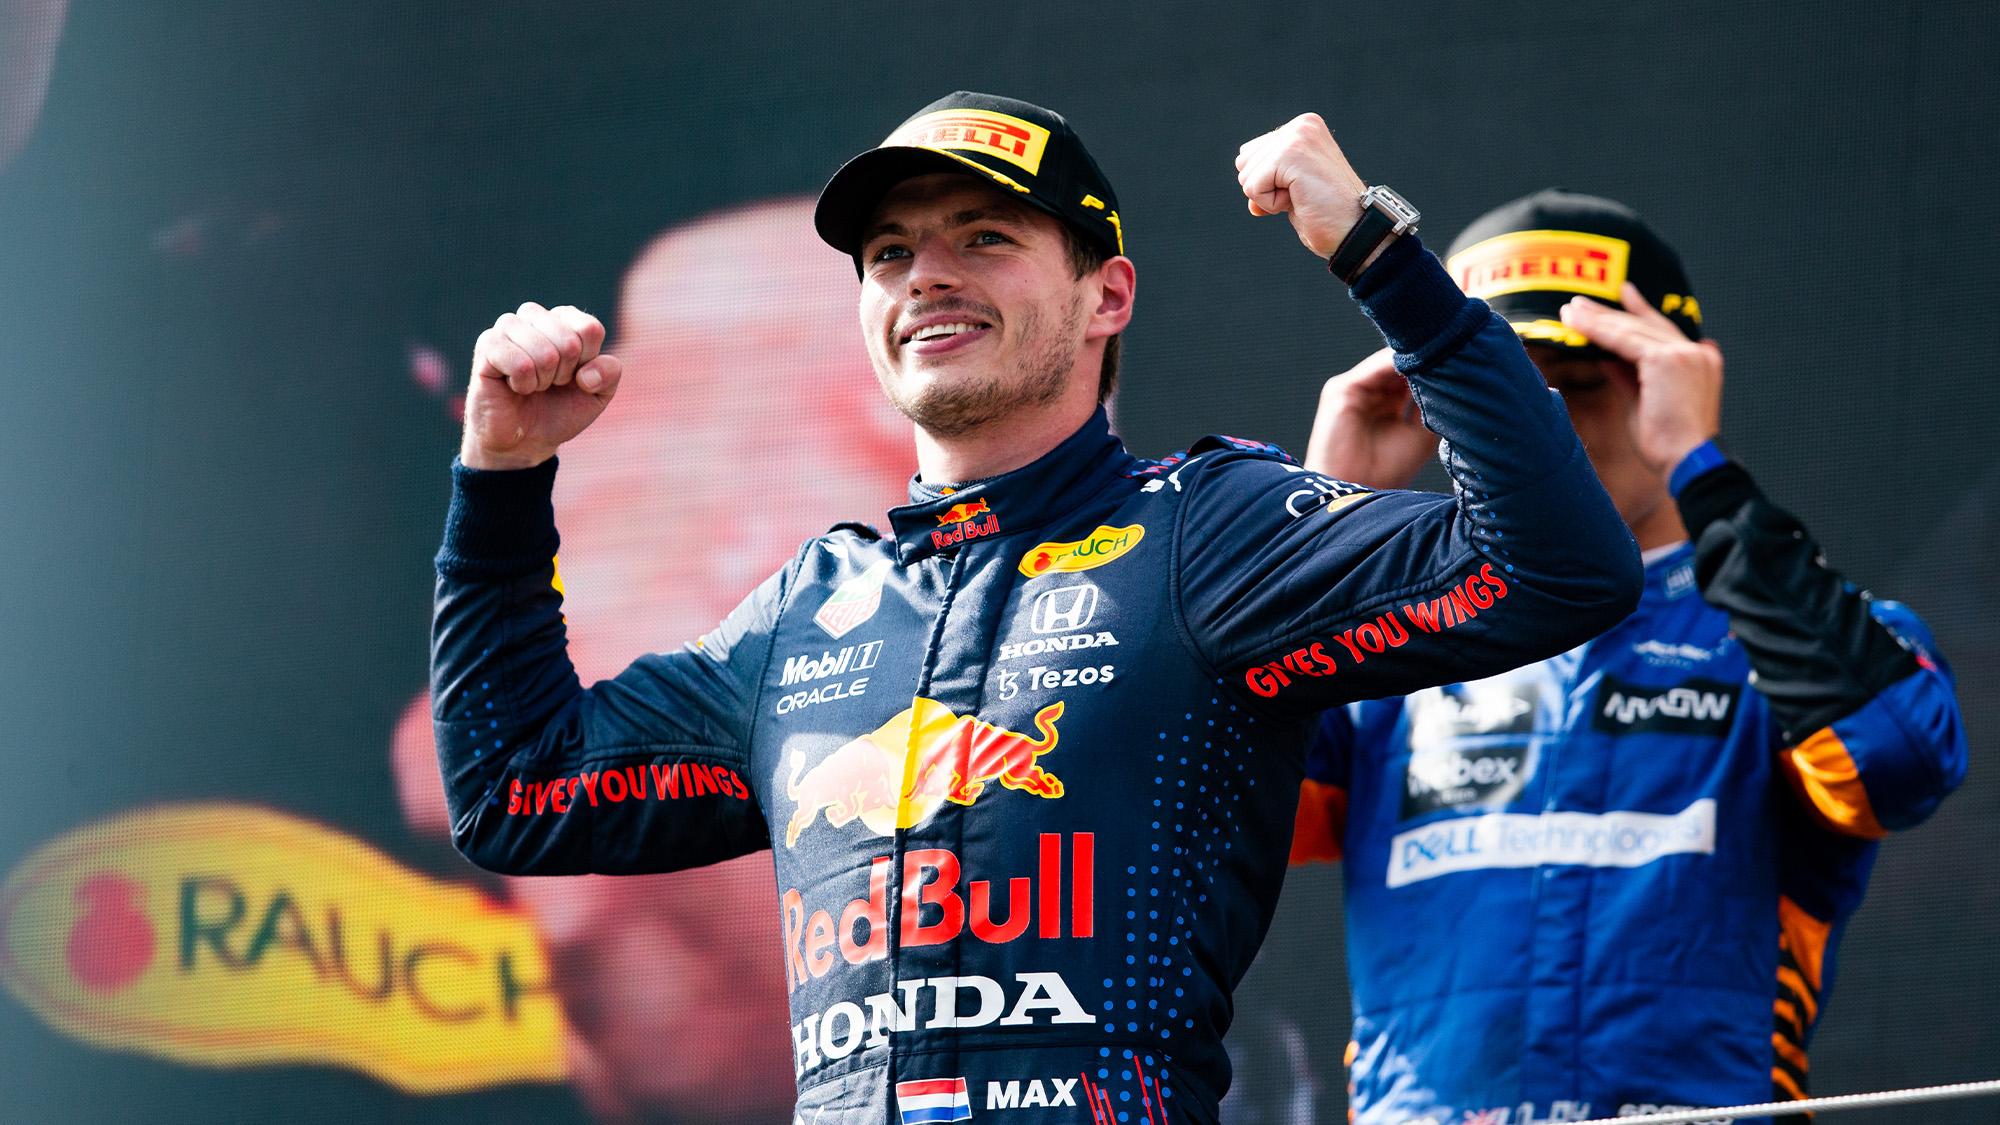 Max Verstappen celebrates victory at the 2021 Austrian Grand Prix